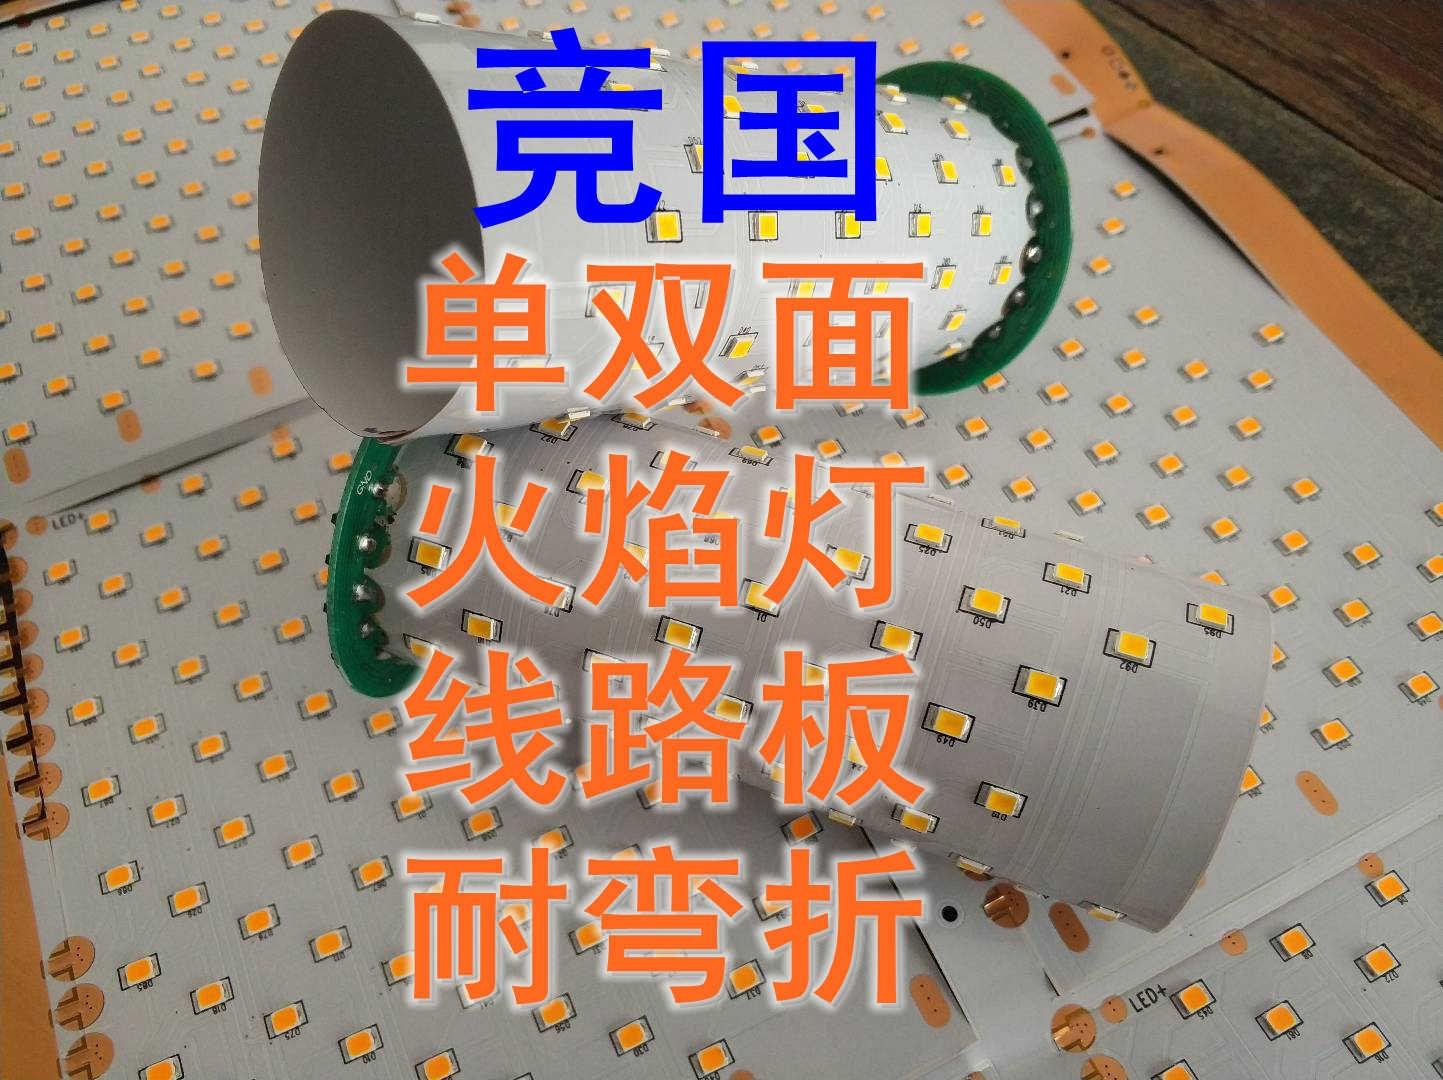 led火焰灯线路板,fpc柔性线路板,pcb电路板快速打样